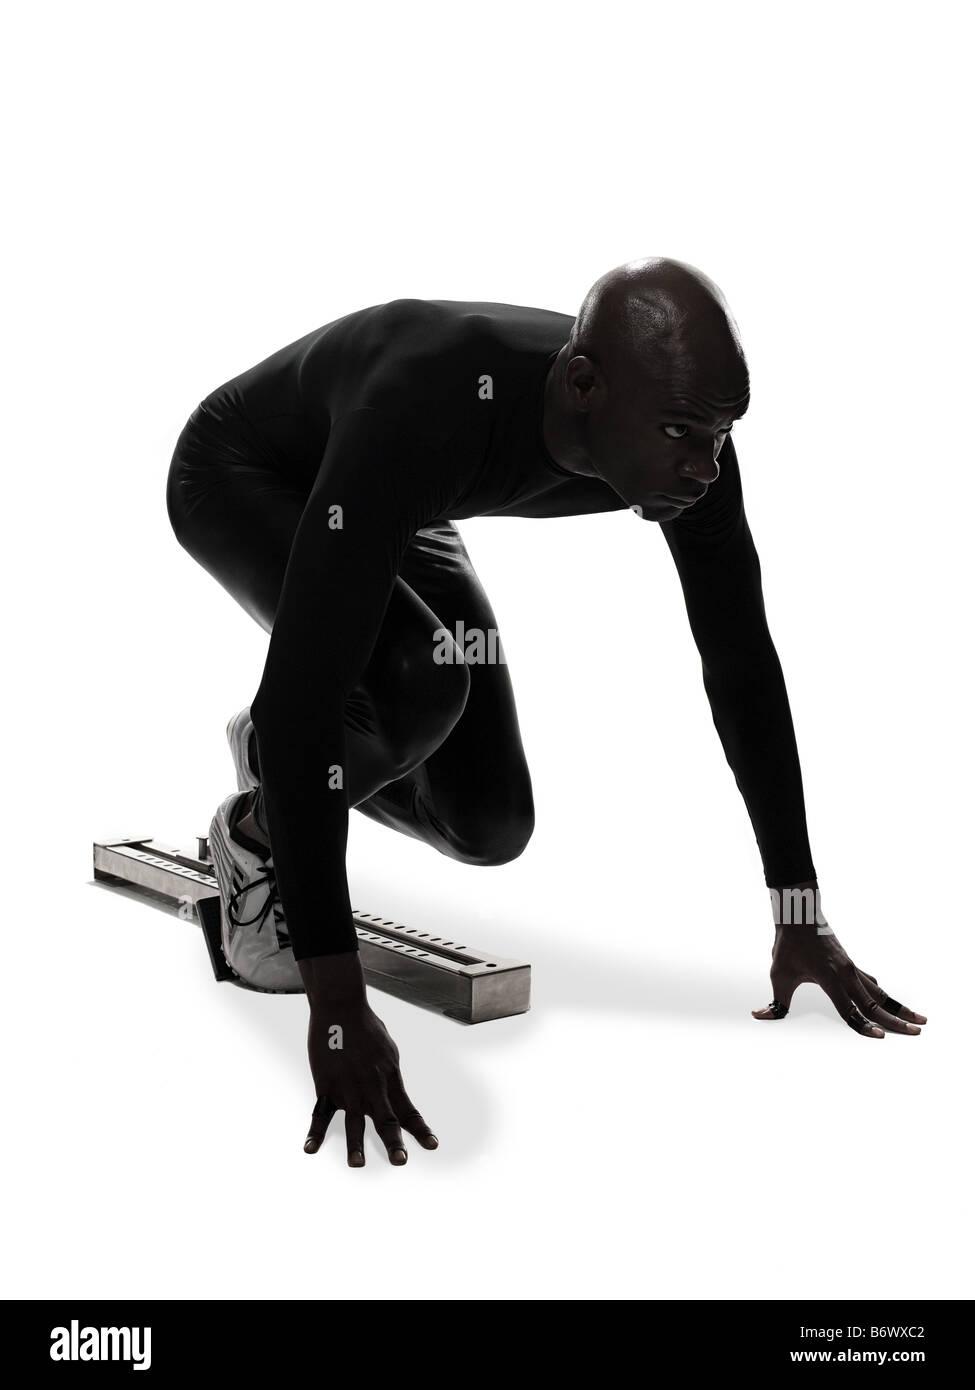 Athlete on starting blocks - Stock Image